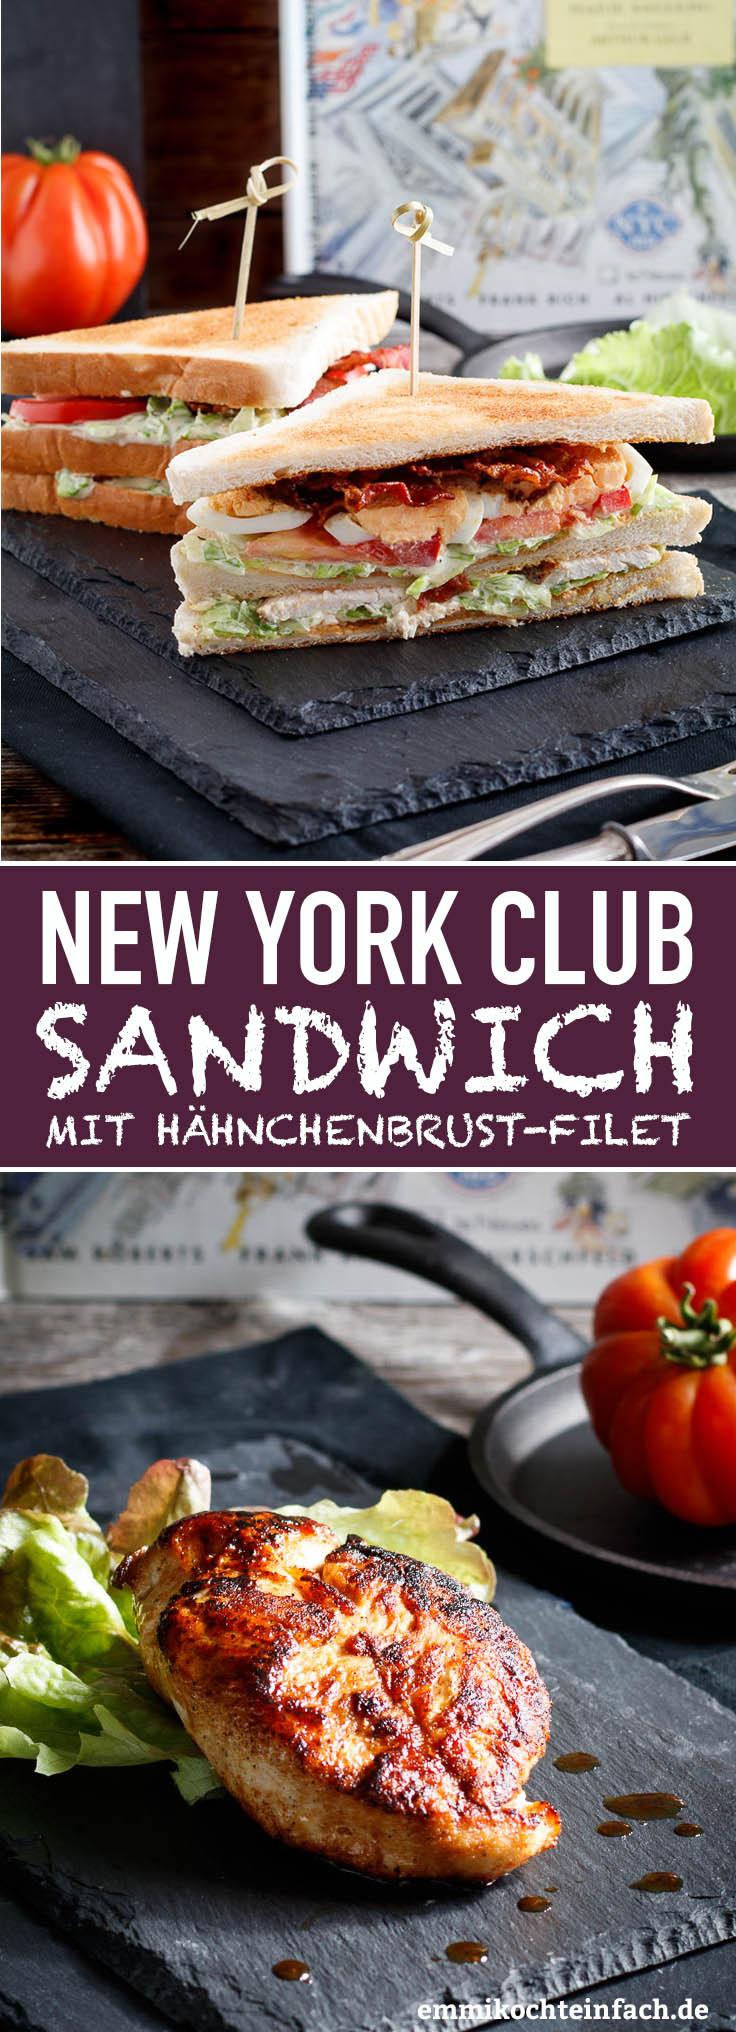 NYork Club Sandwich - www.emmikochteinfach.de